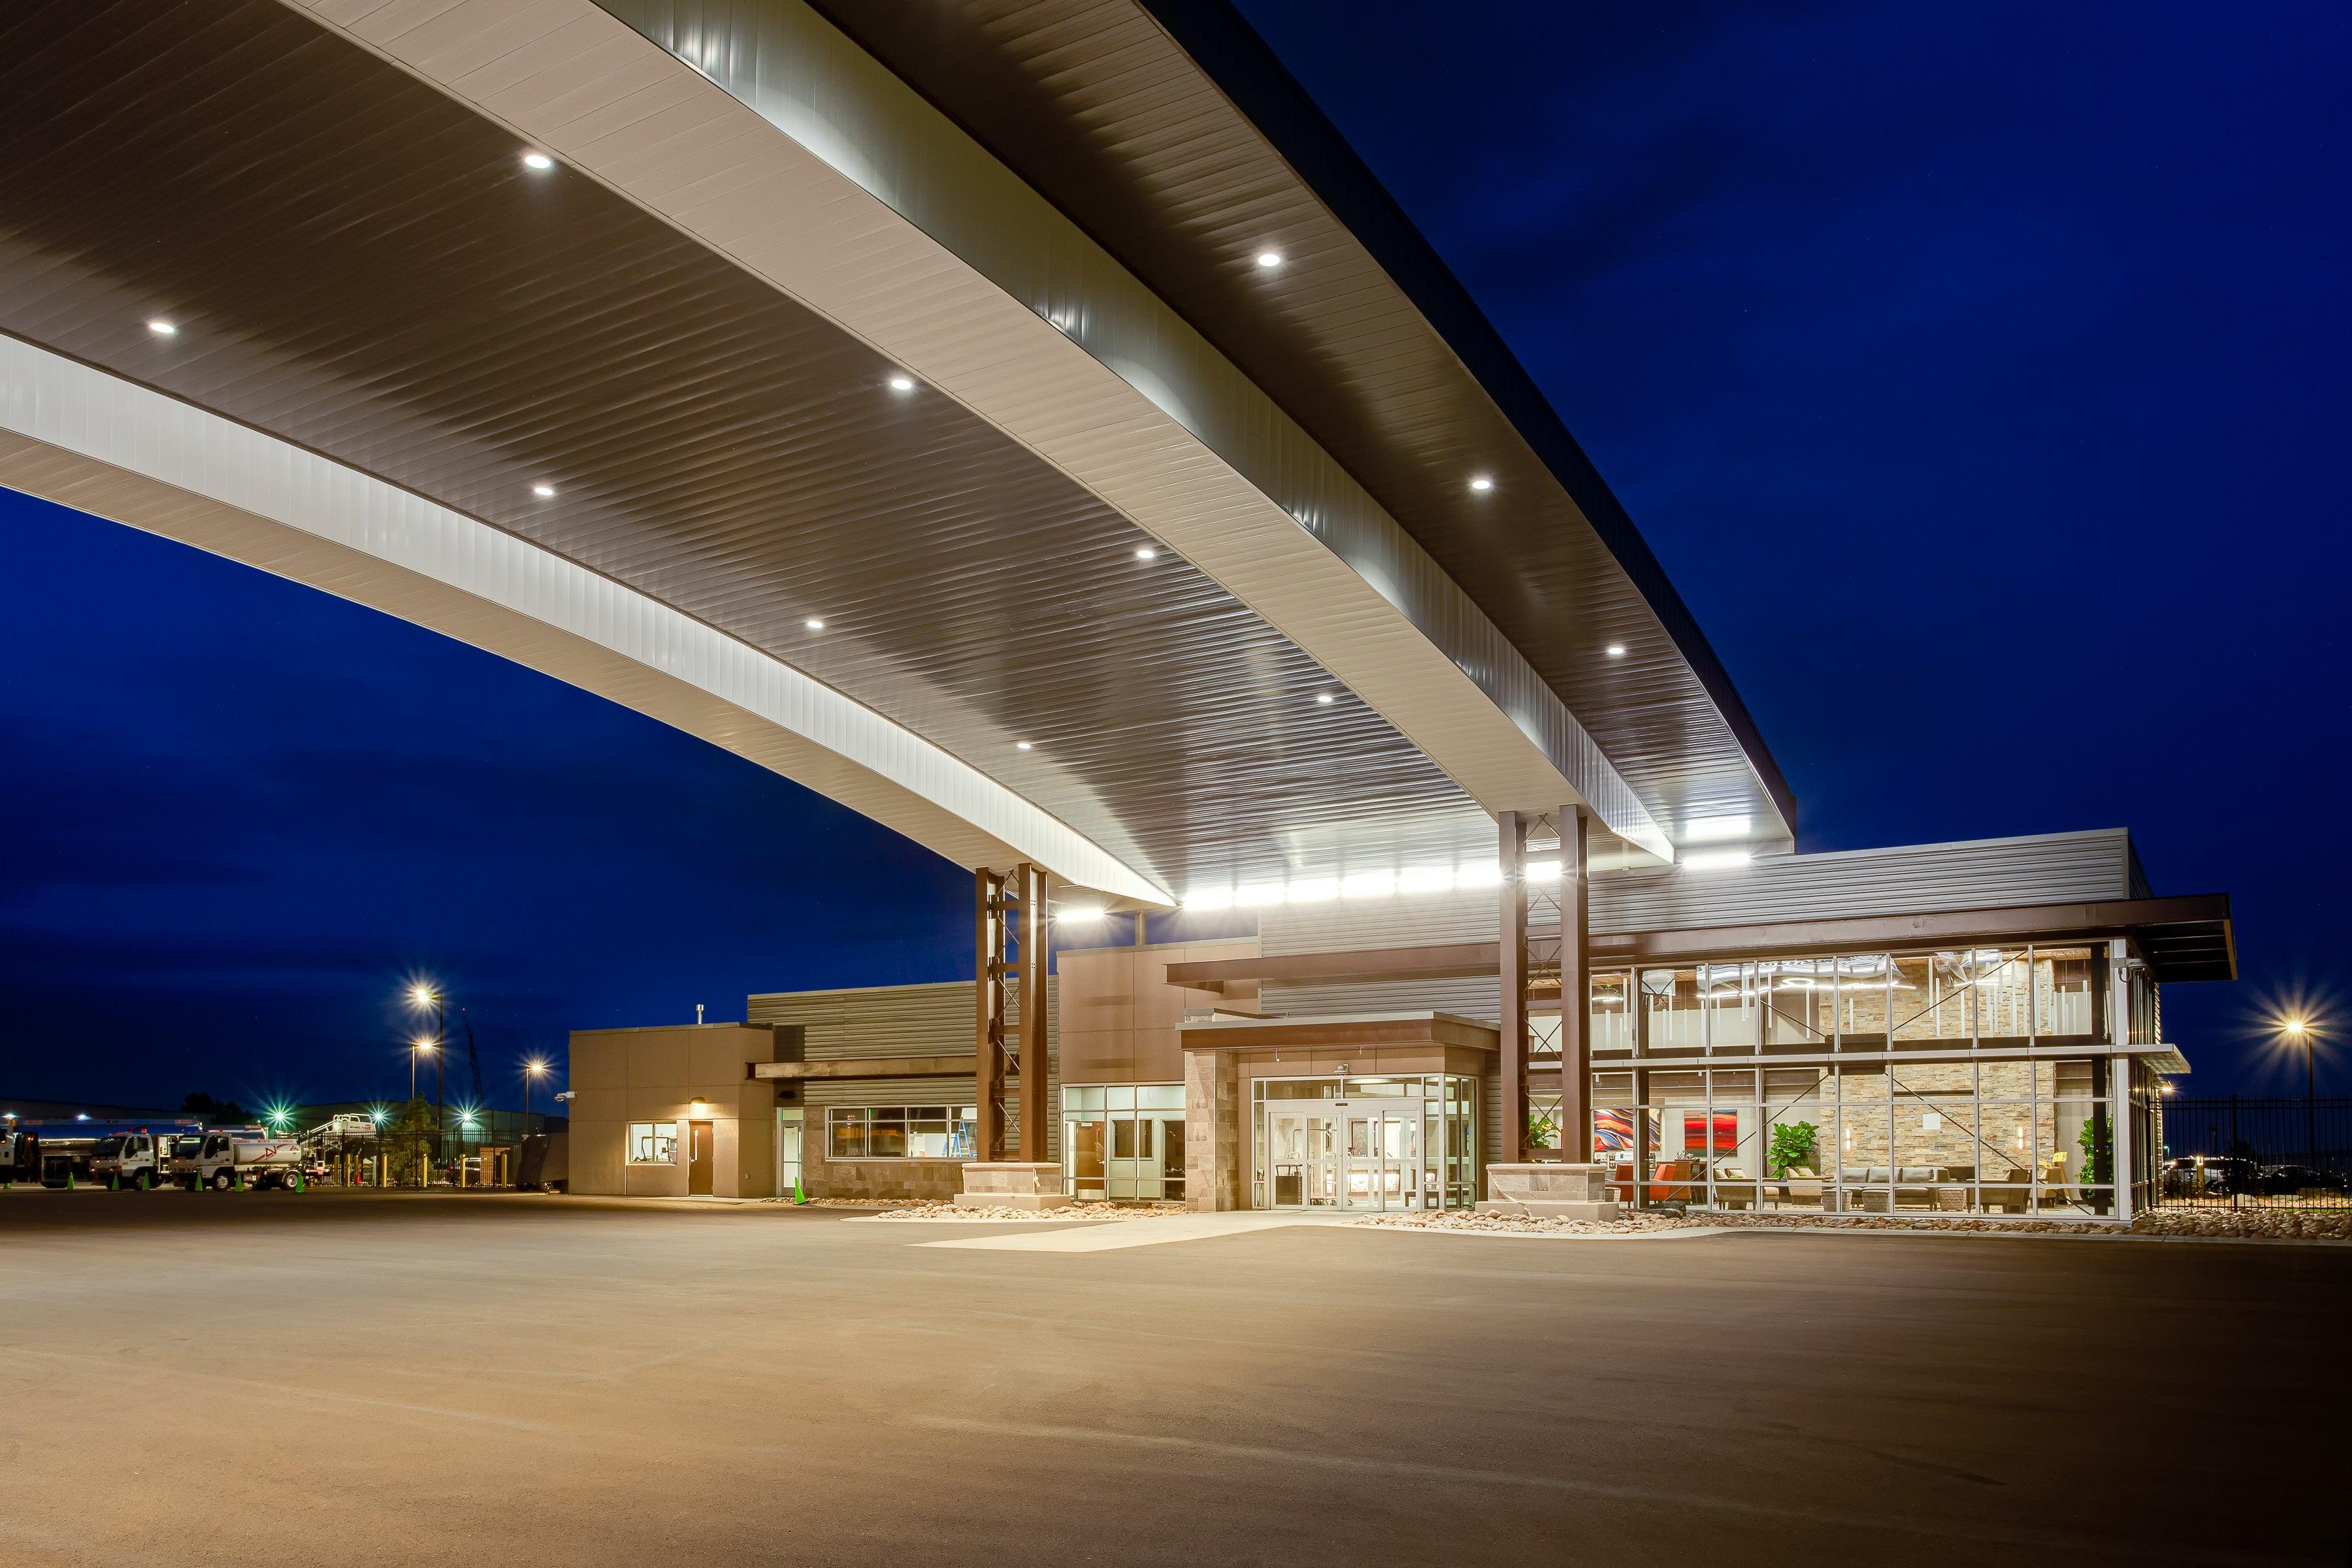 Rocky Mountain Metropolitan Airport Drive-Through Canopy